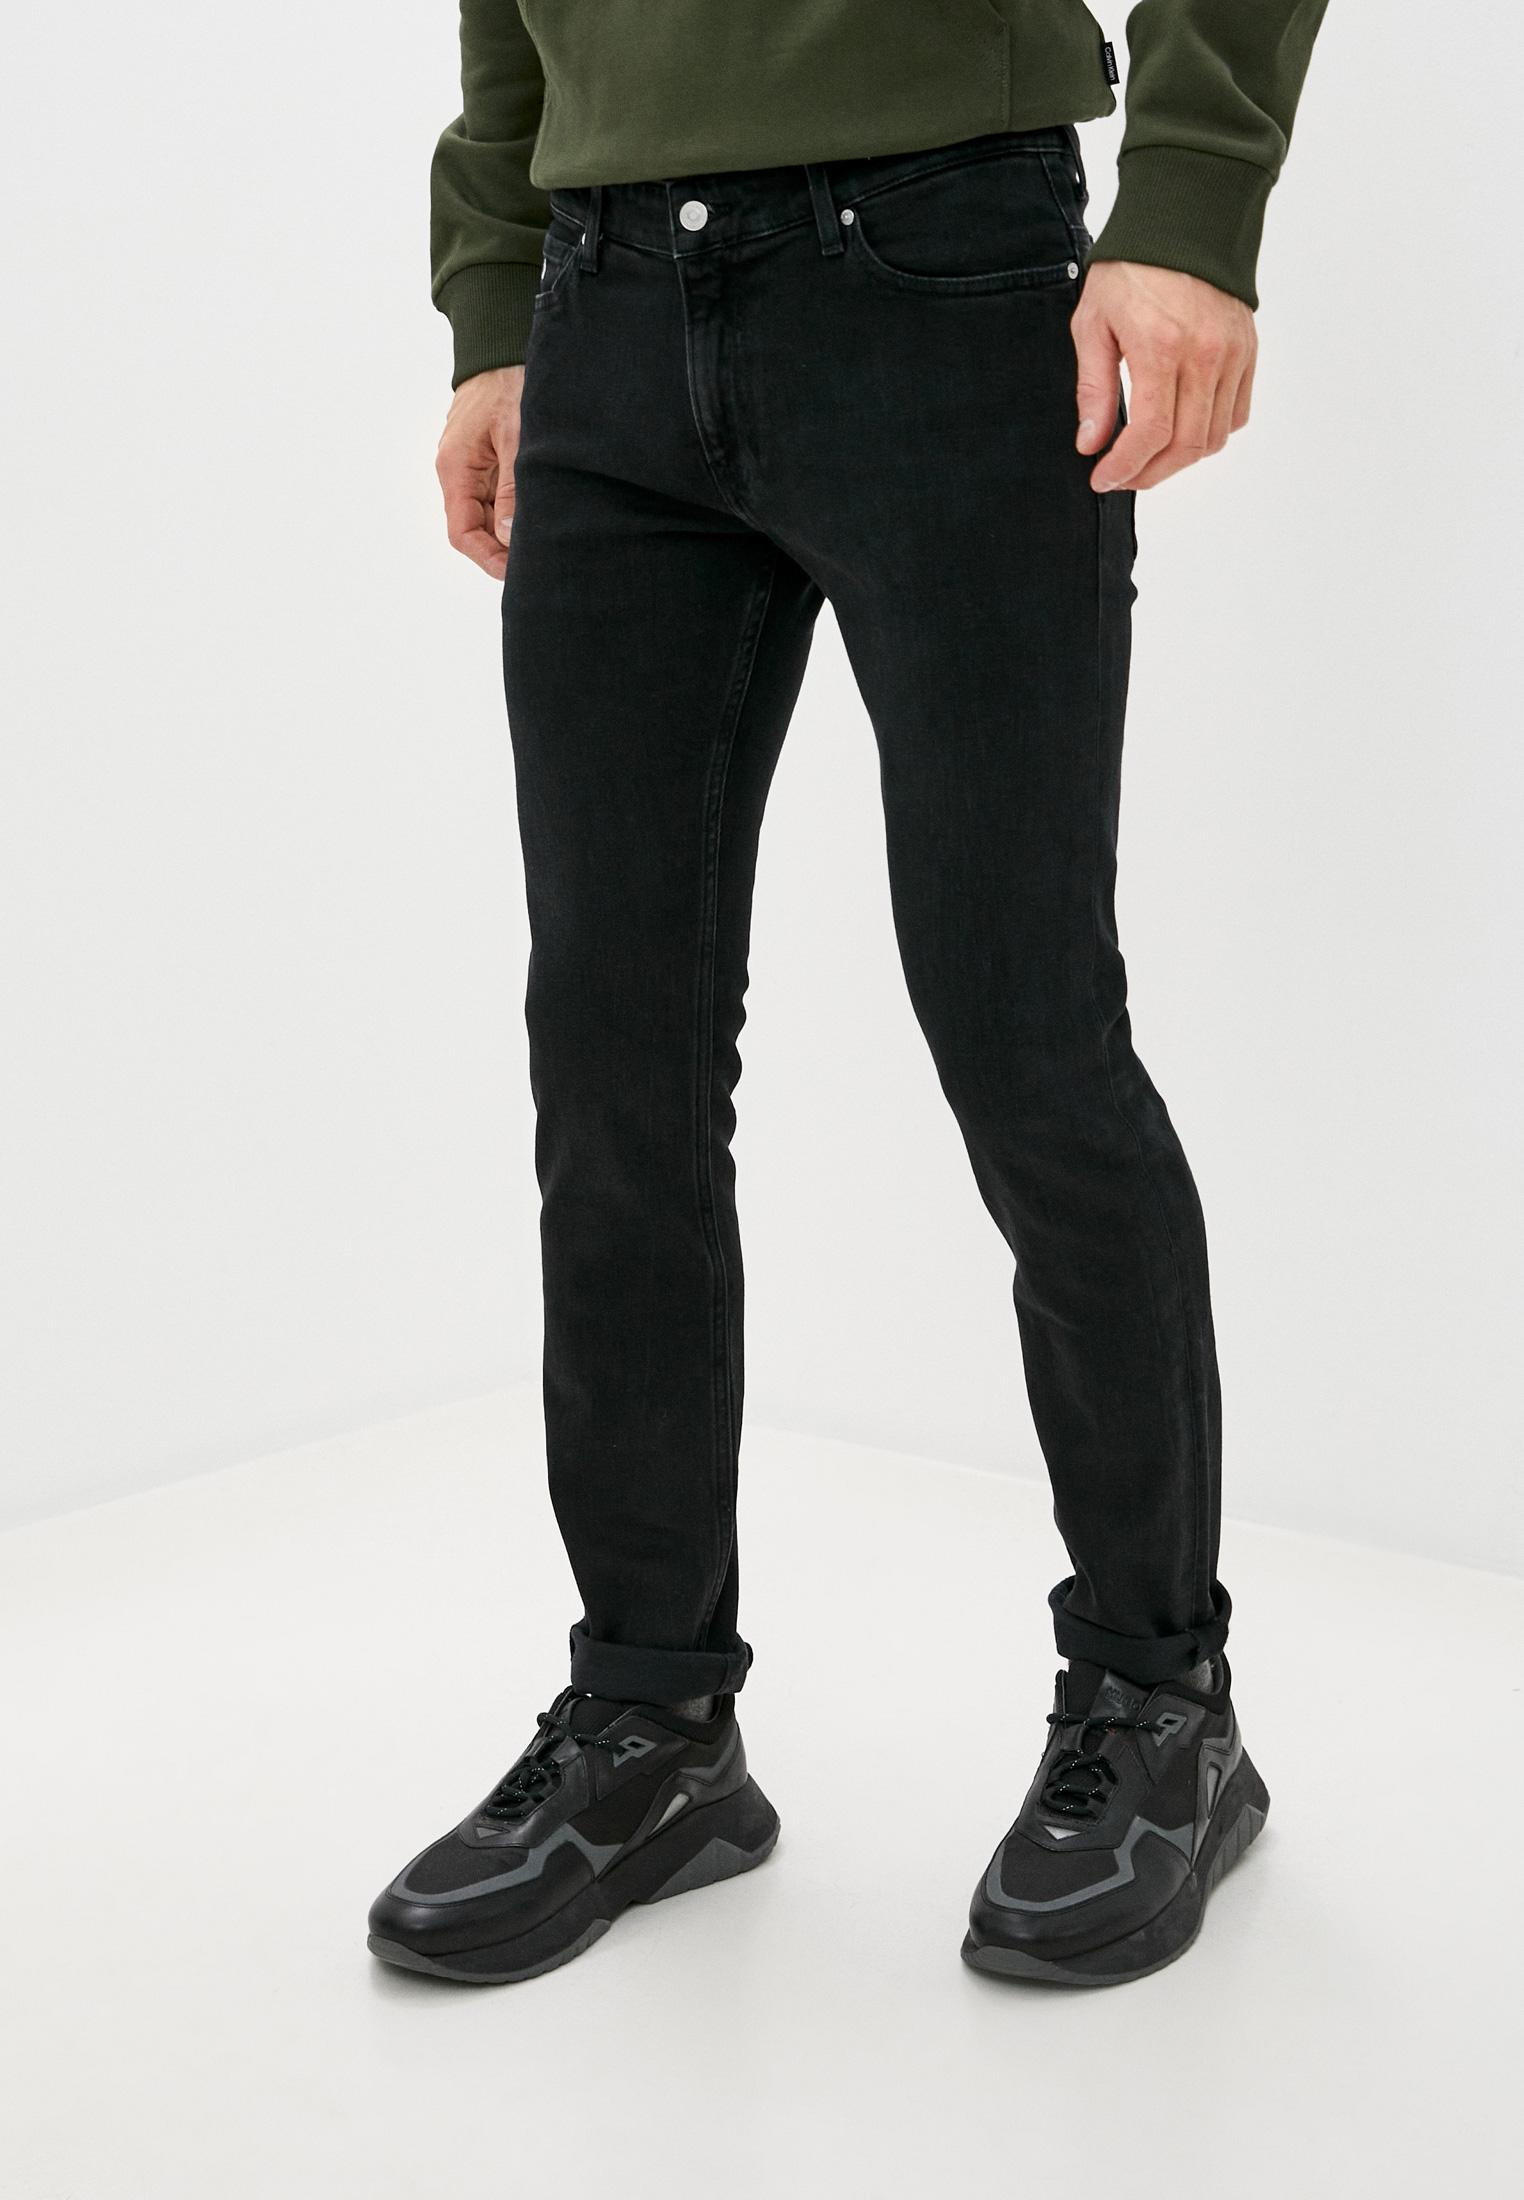 Зауженные джинсы Calvin Klein (Кельвин Кляйн) k10k106443